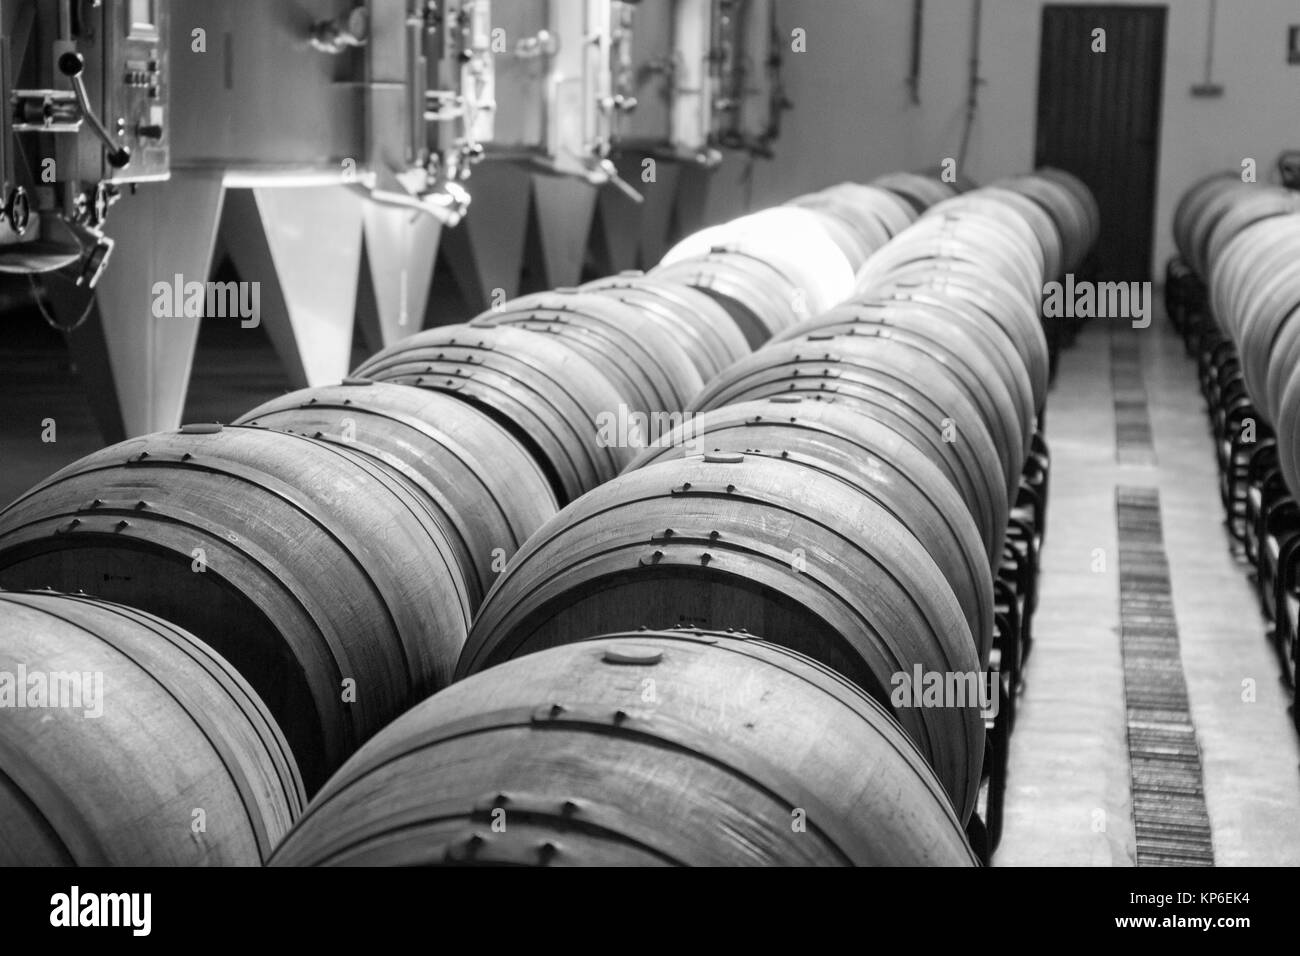 Cellar interior in La Mancha Albacete Spain Los Aljibes vinery on February 12, 2017. - Stock Image